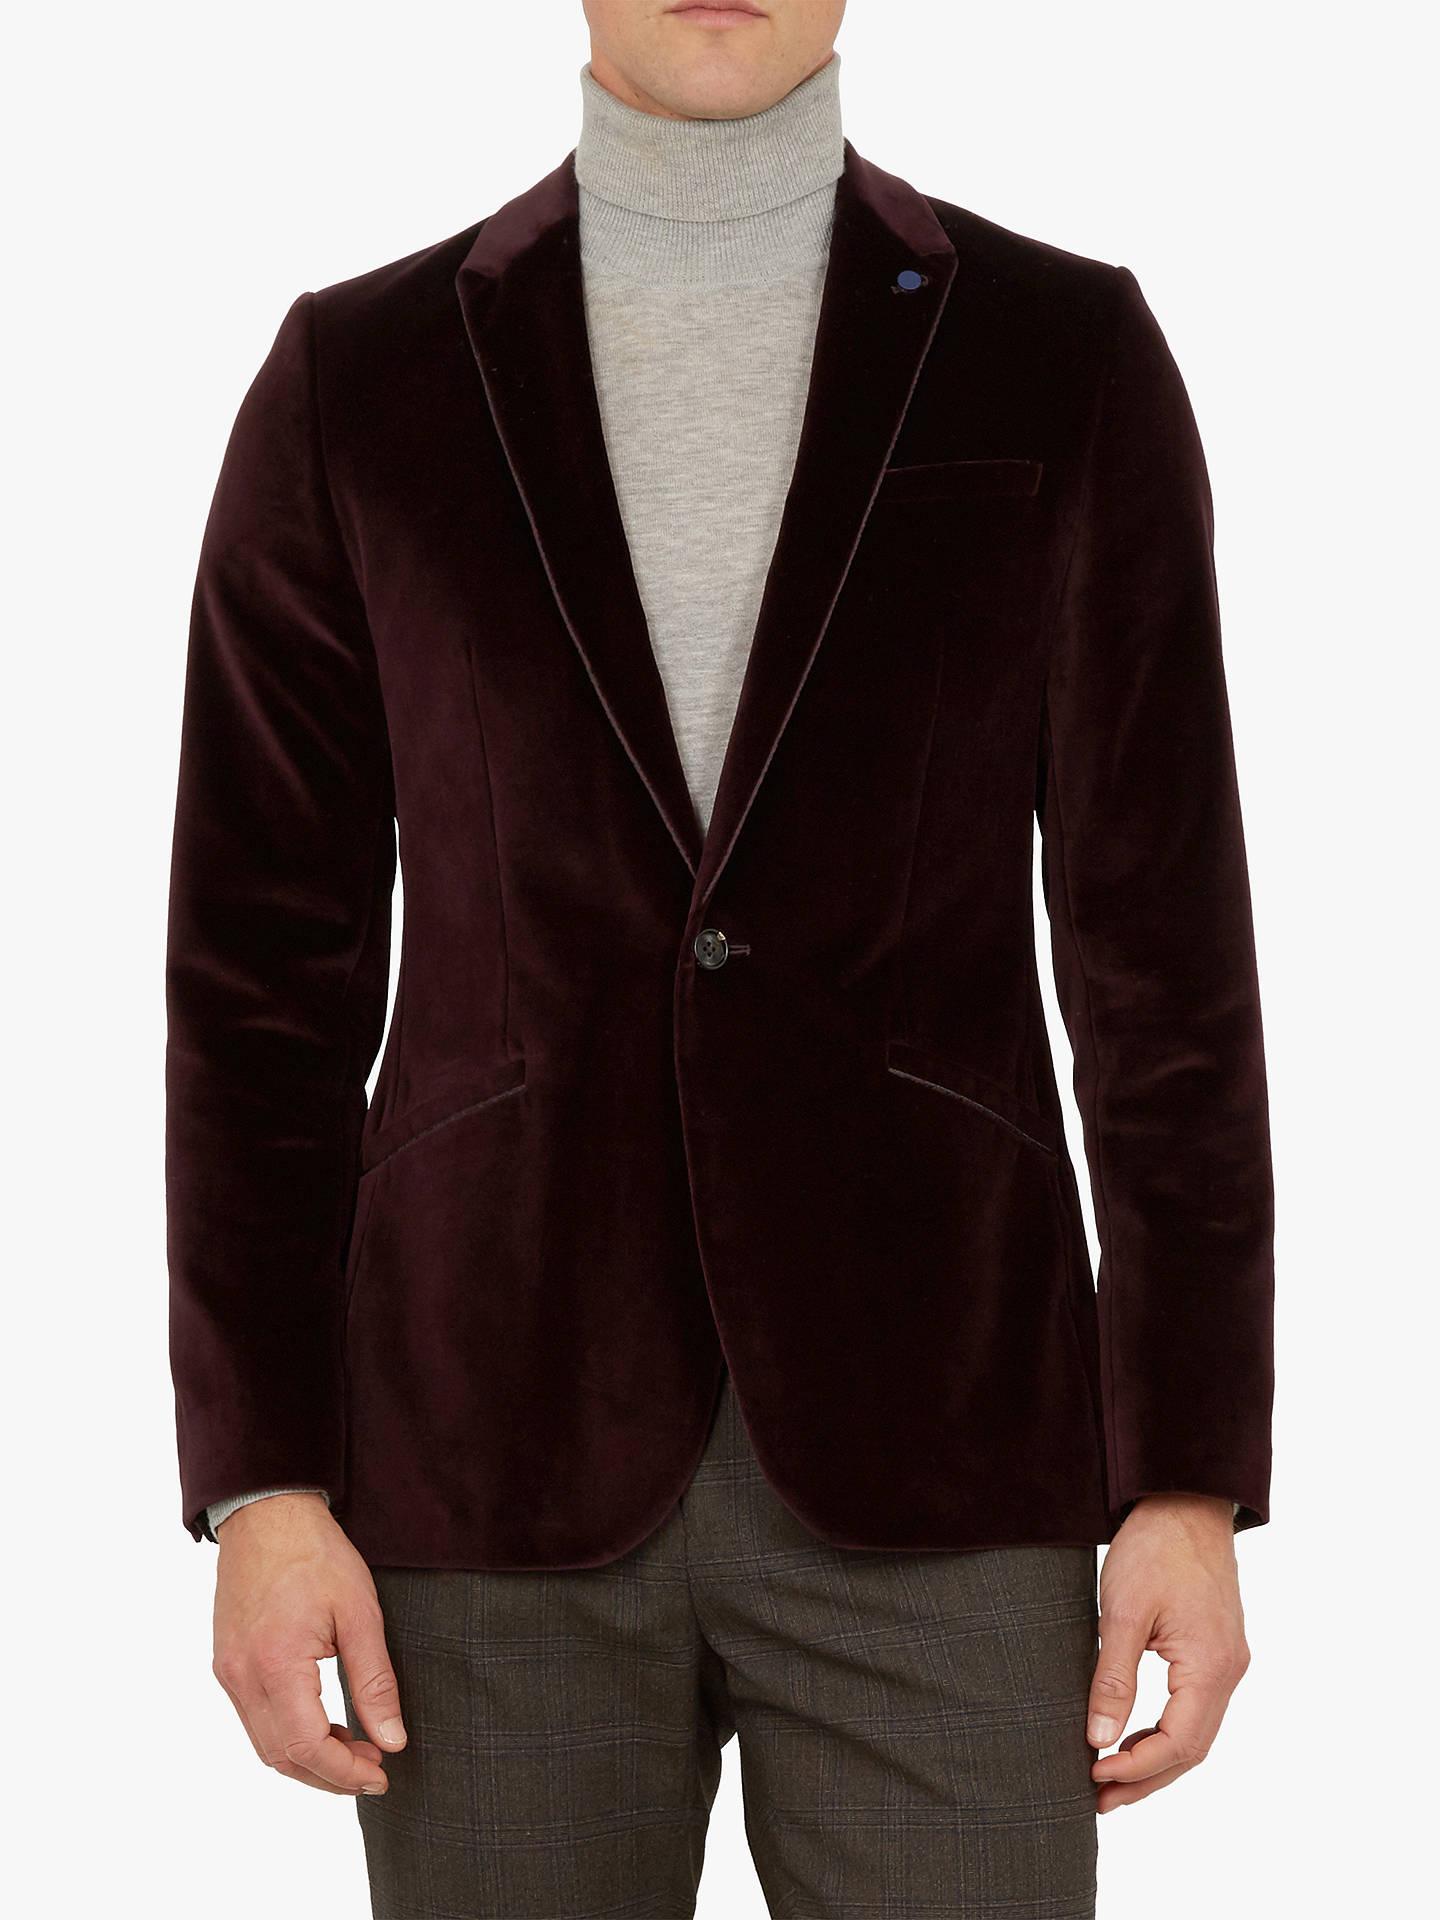 46d7bc30aa03 Ted Baker Maribo Velvet Jacket at John Lewis   Partners